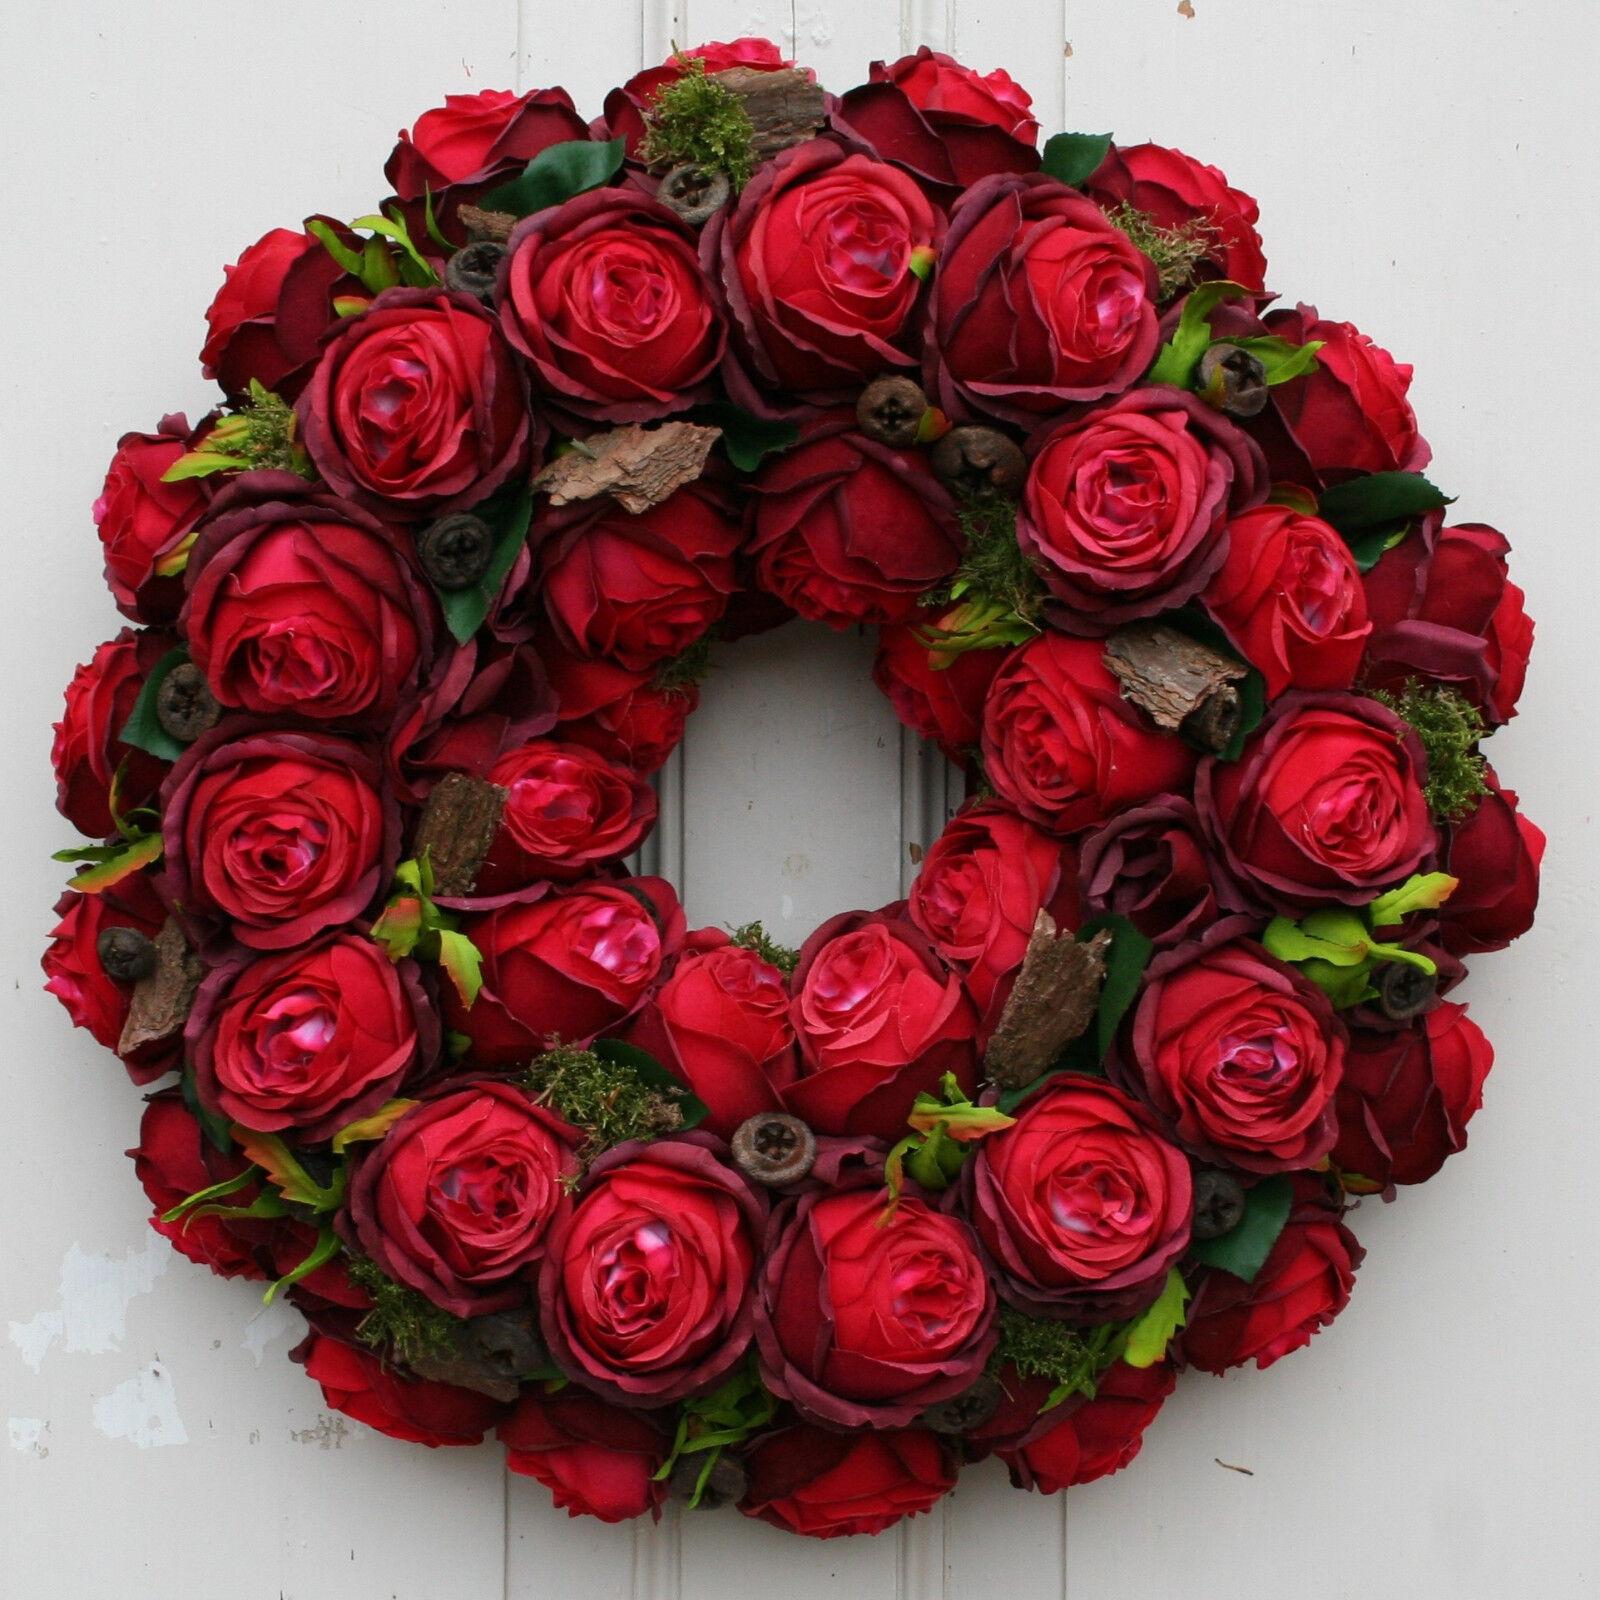 Türkranz Türkranz Türkranz Dekokranz Wandkranz Kranz Türdeko mit roten SeidenBlaumen Rosan 46 cm 39ef4d